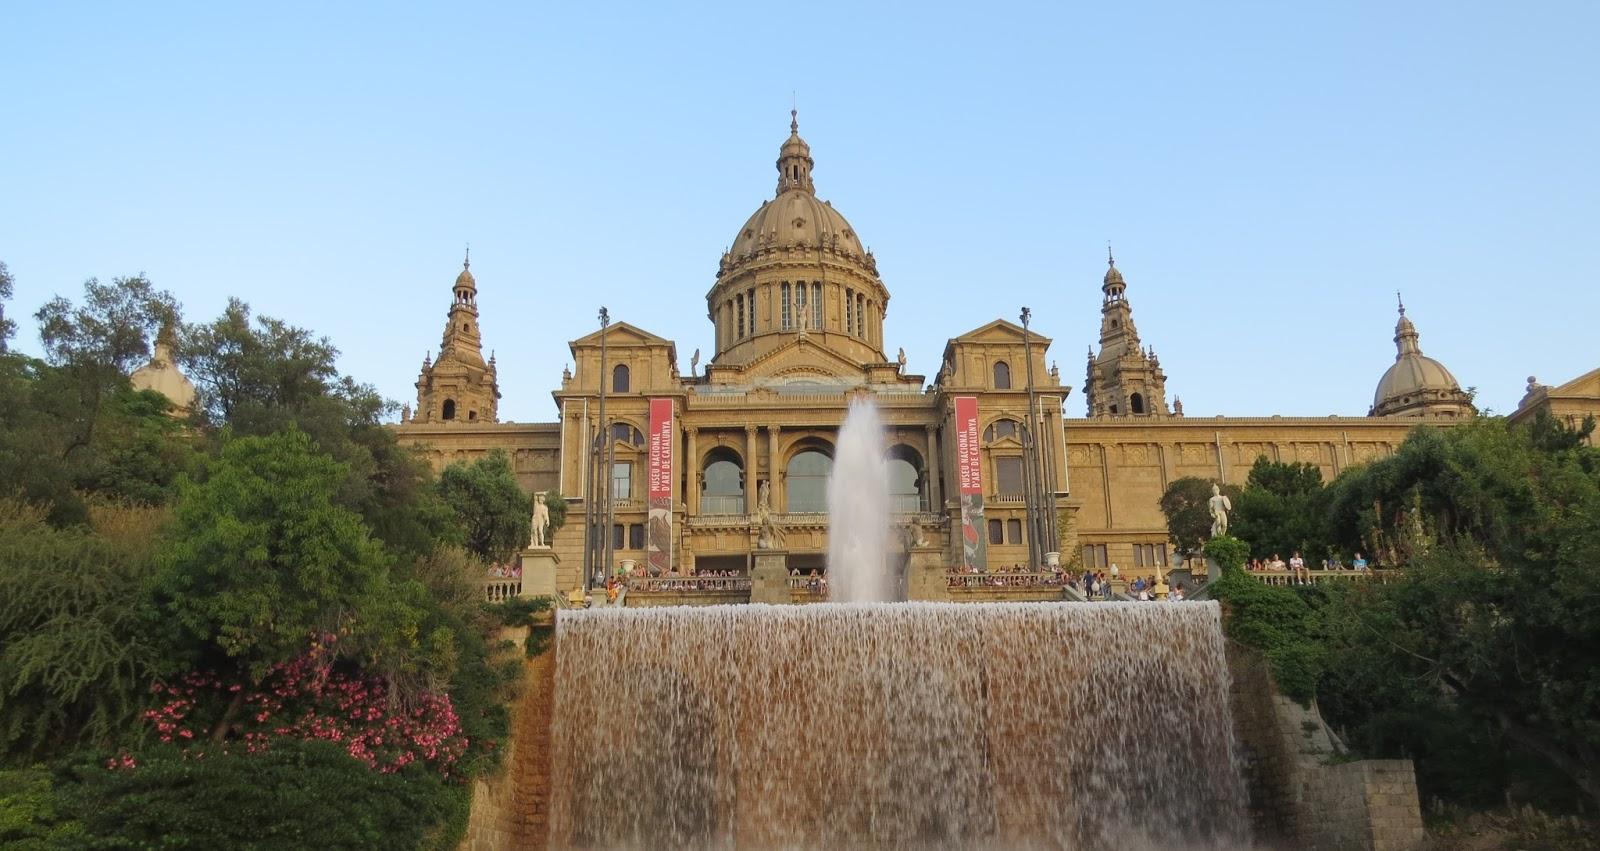 Palau Nacional em Barcelona